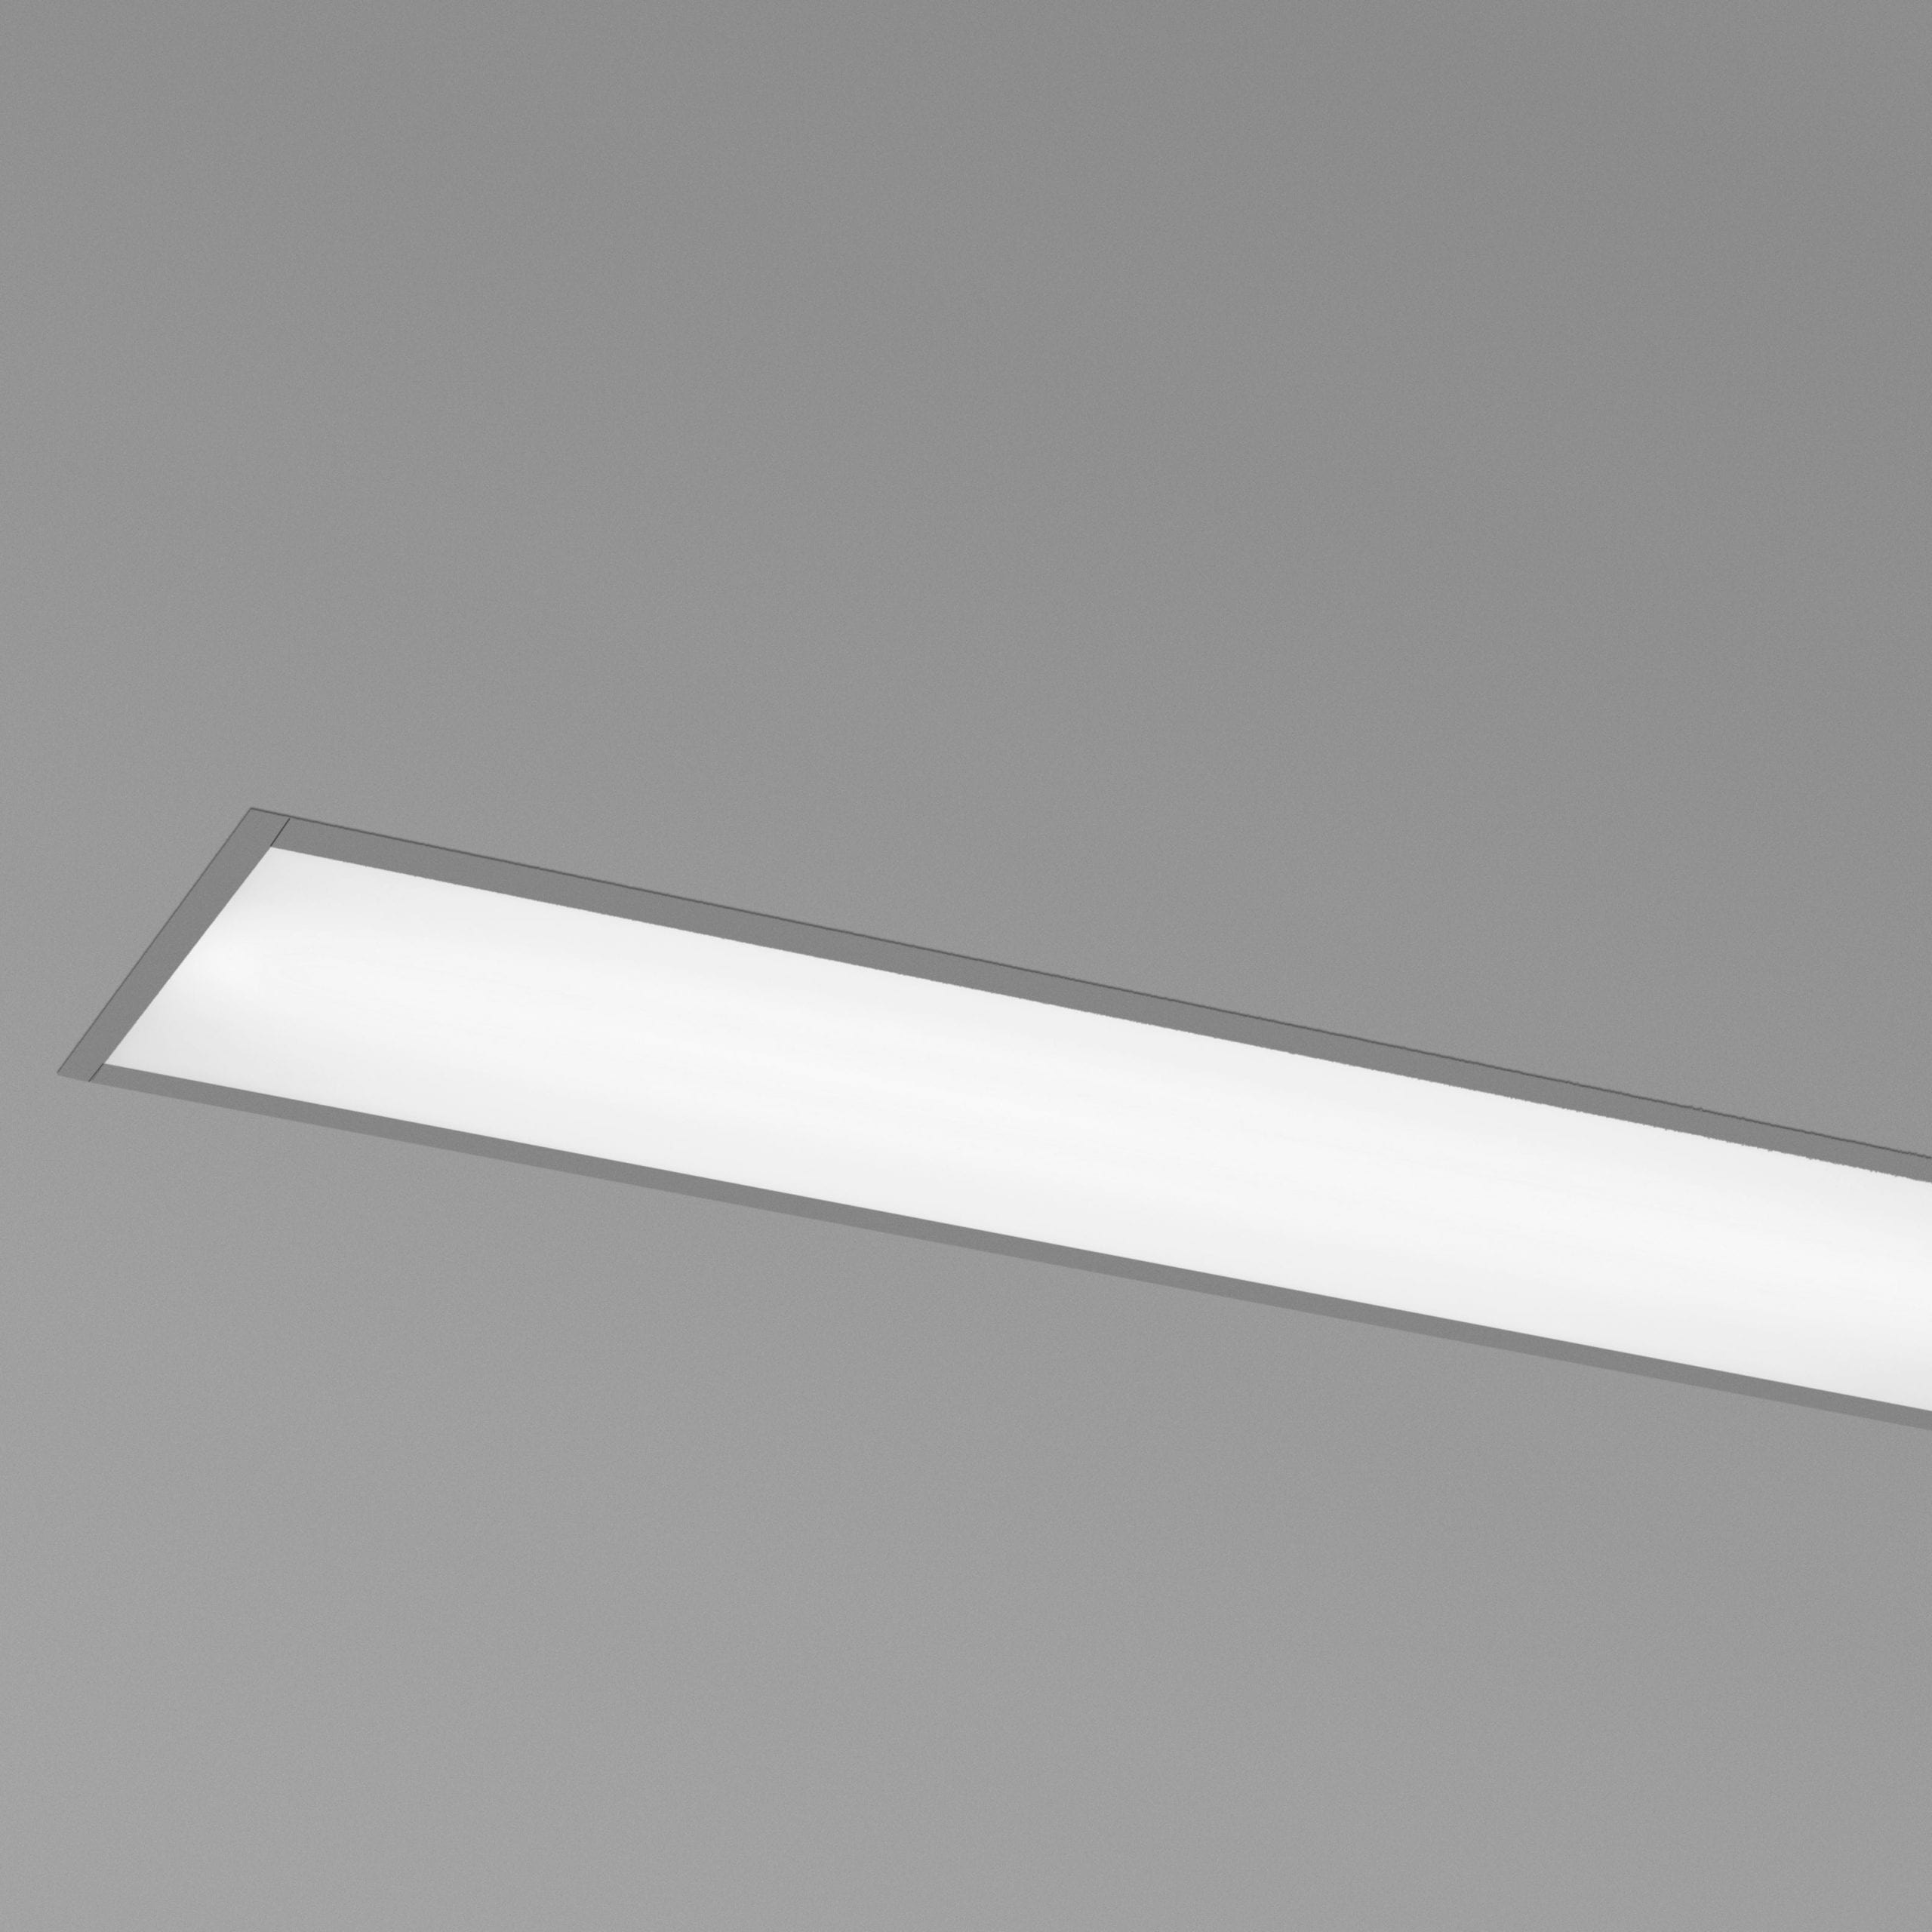 LightPlane 5 Recessed